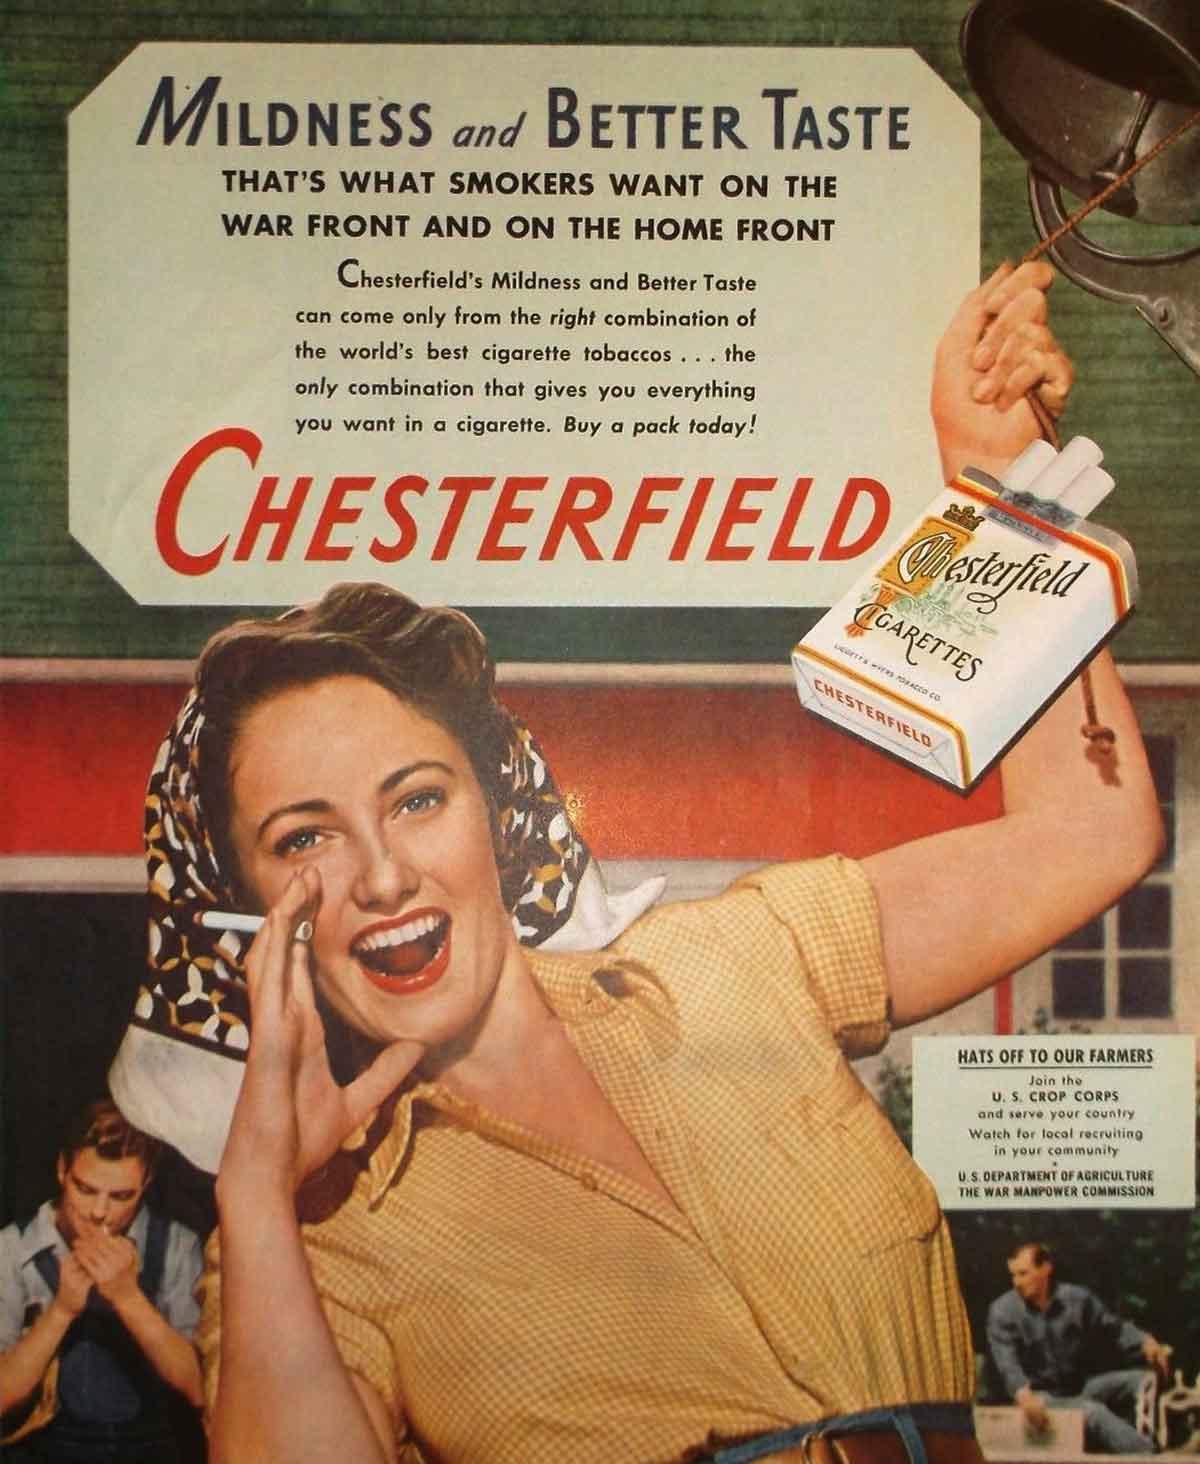 1940s-Fashion---Cigarettes-and-the-Slim-Silhouette---Camel3